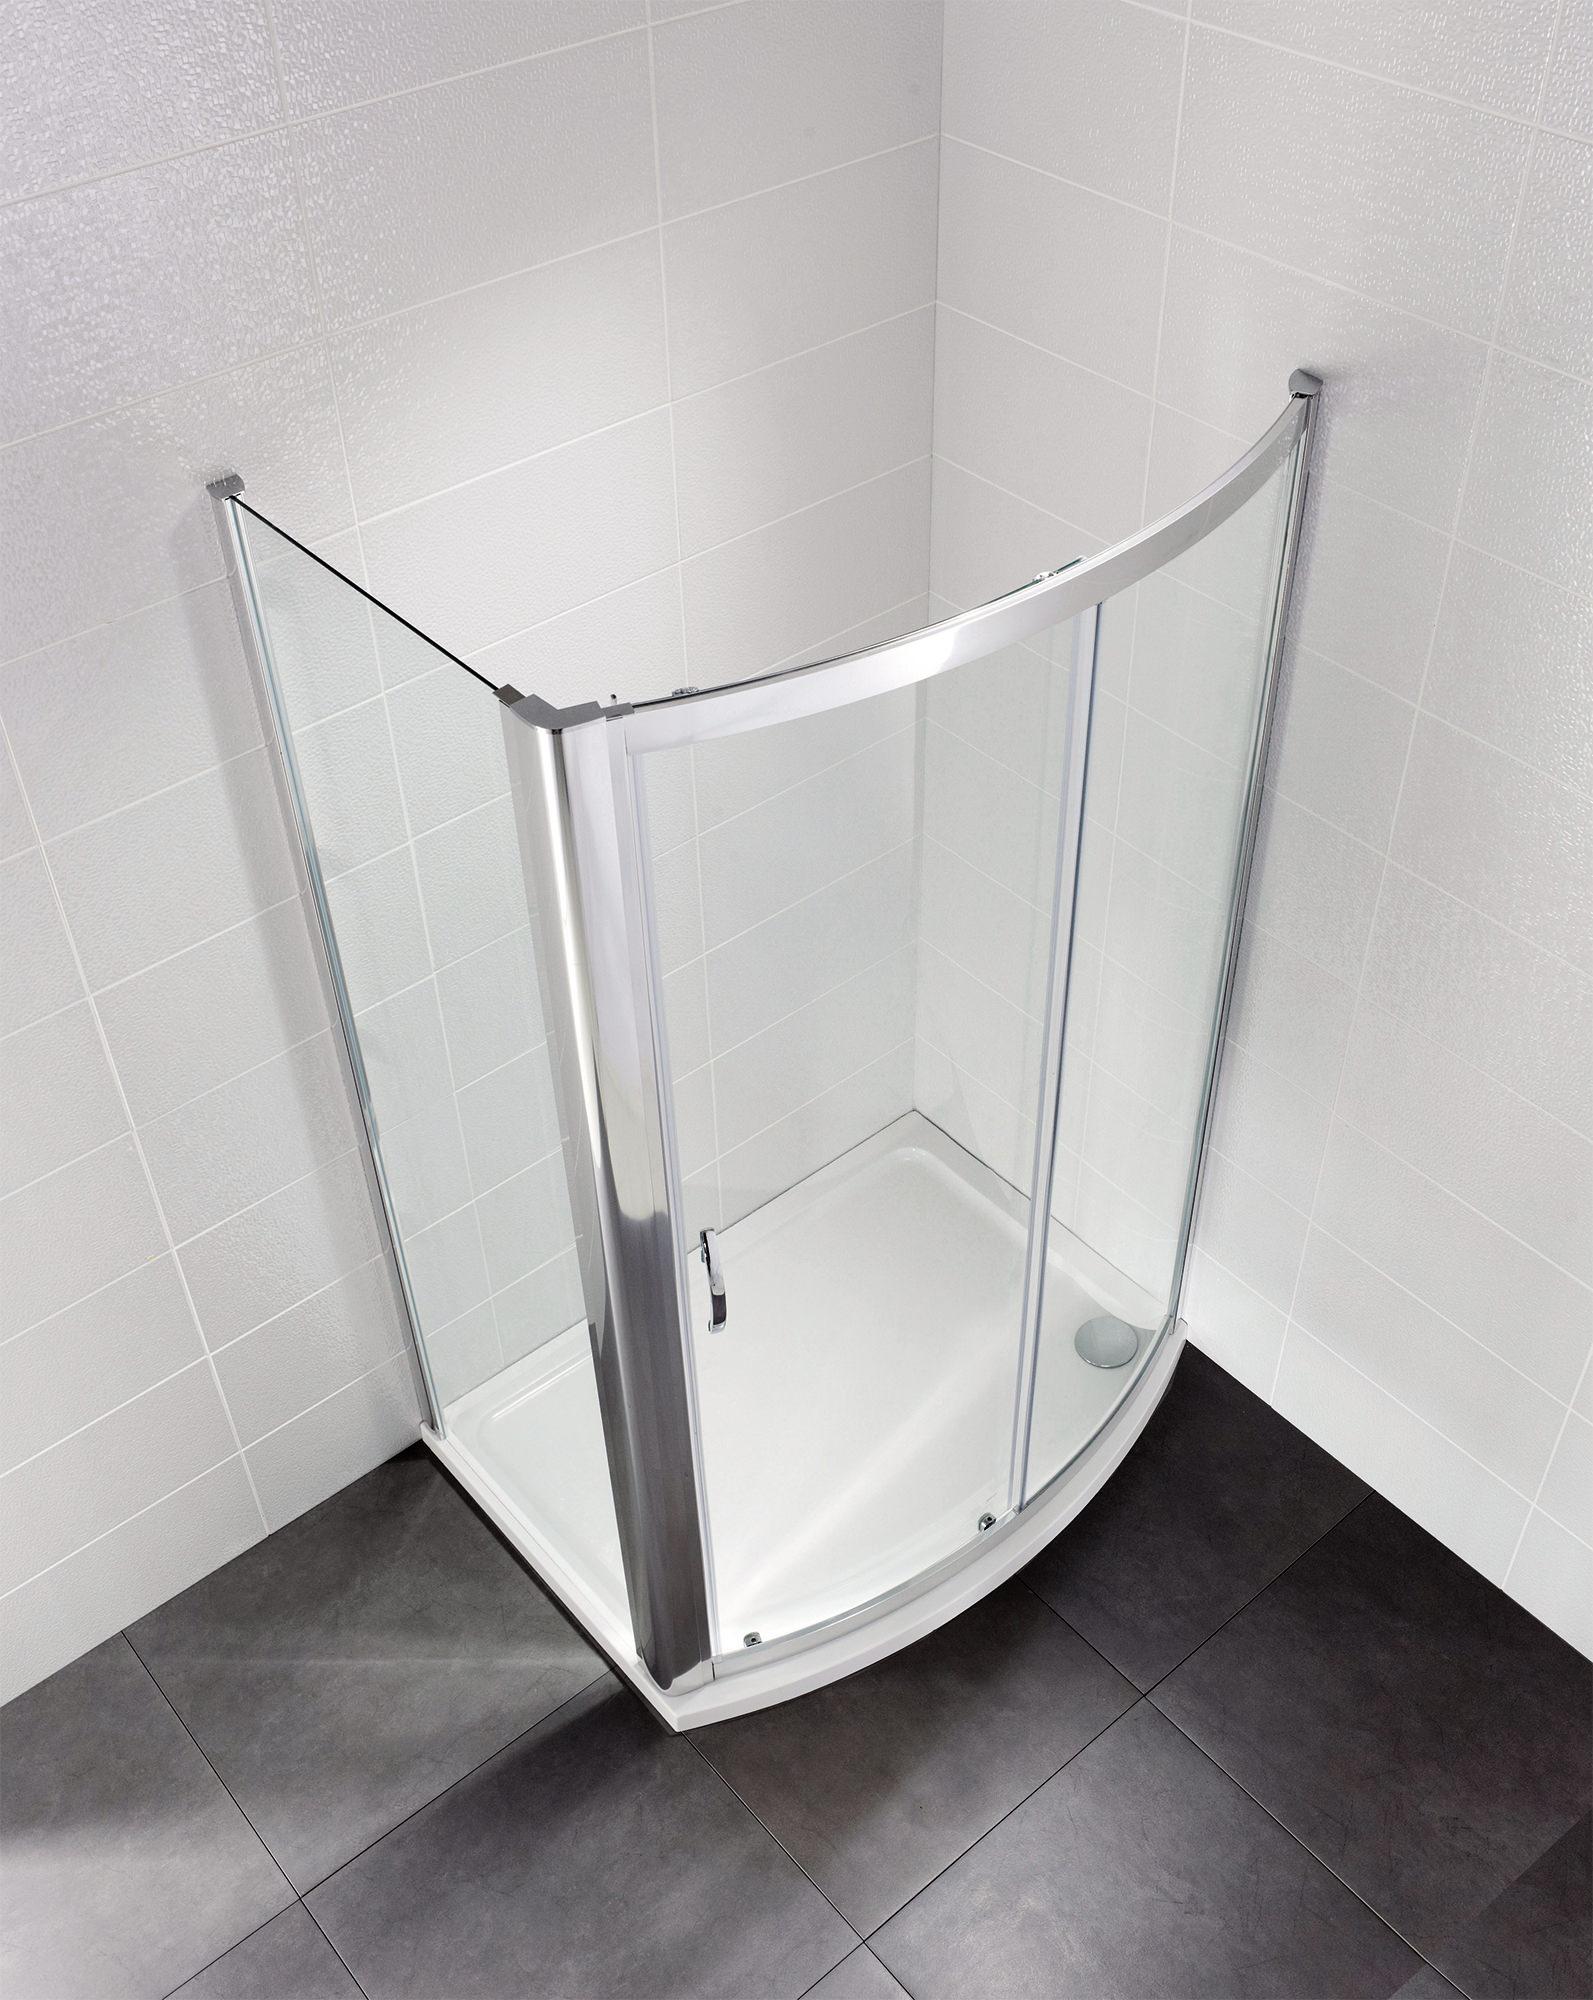 April Identiti2 1200mm Bow Fronted Sliding Shower Door